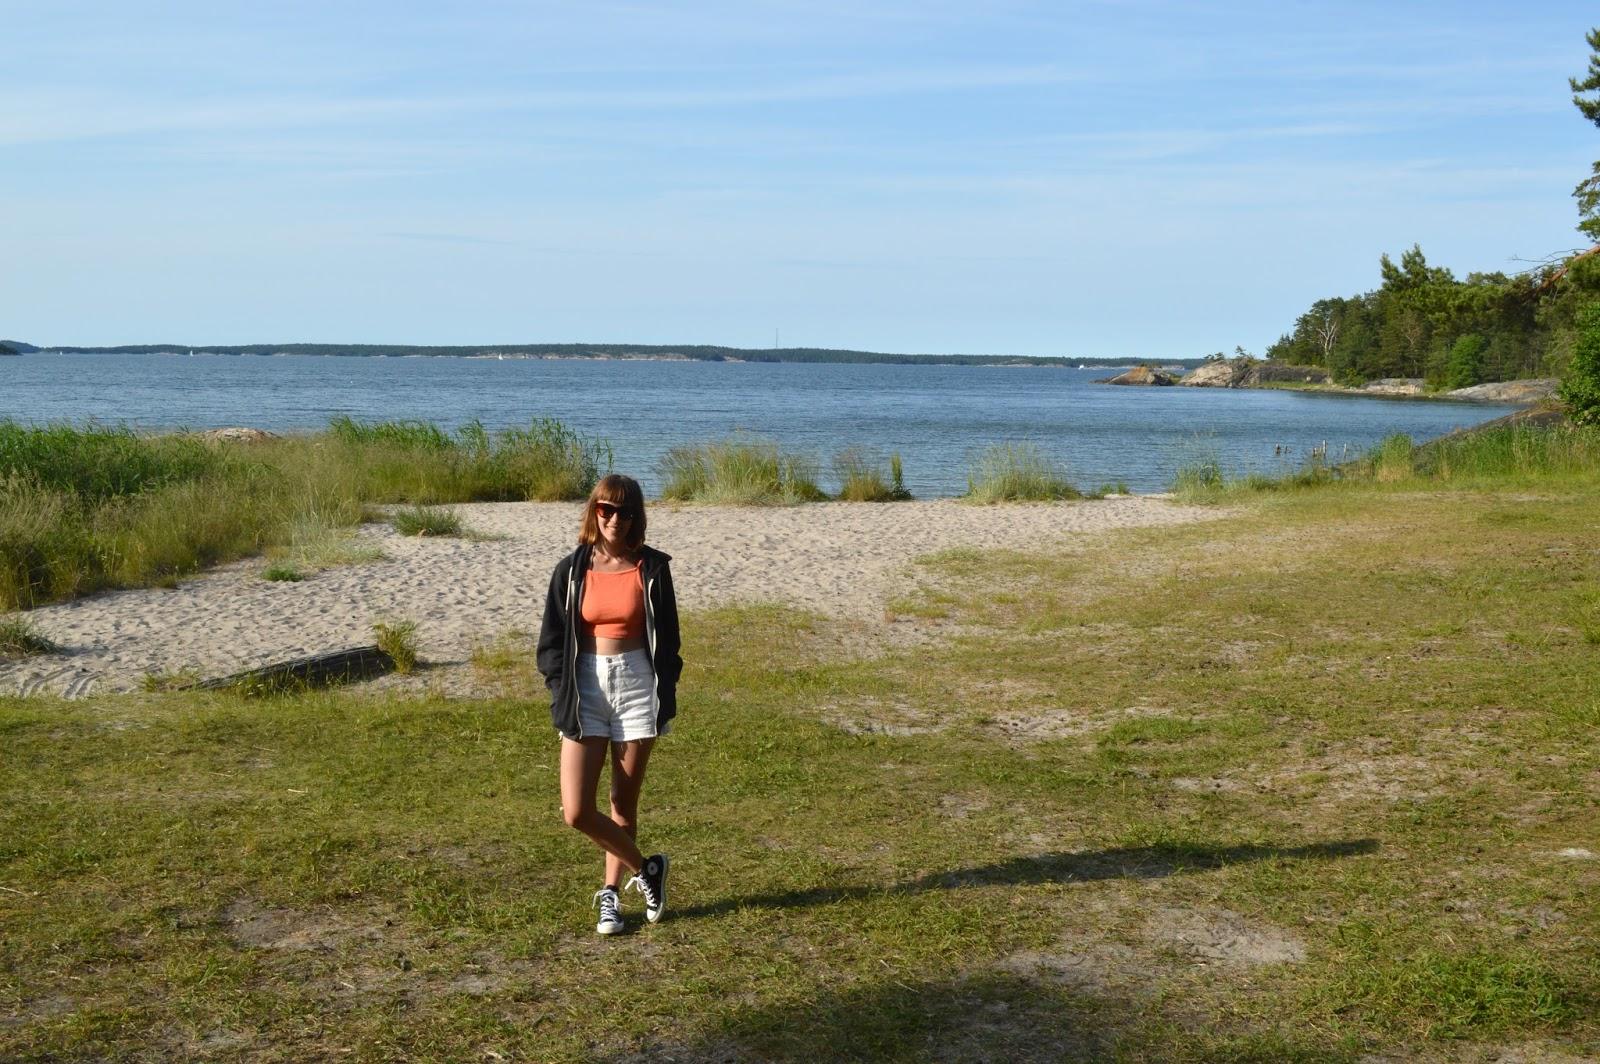 Me on beach near Gruvbryggan, Utö Stockholm archipelago